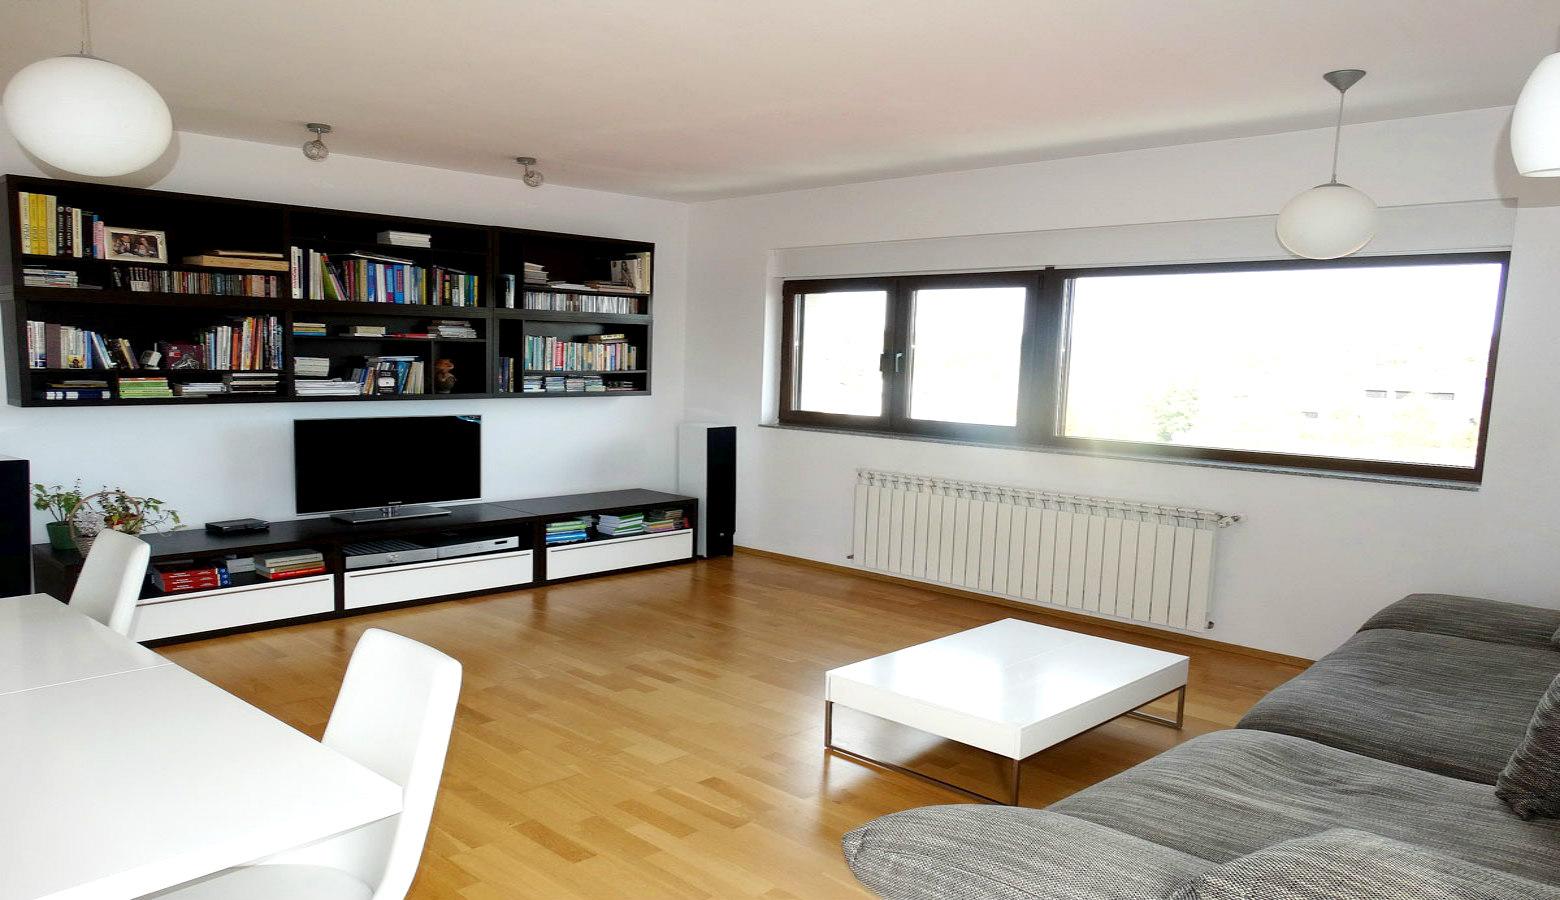 Apartament 4 camere, mobilat si utilat modern, Iancu Nicolae